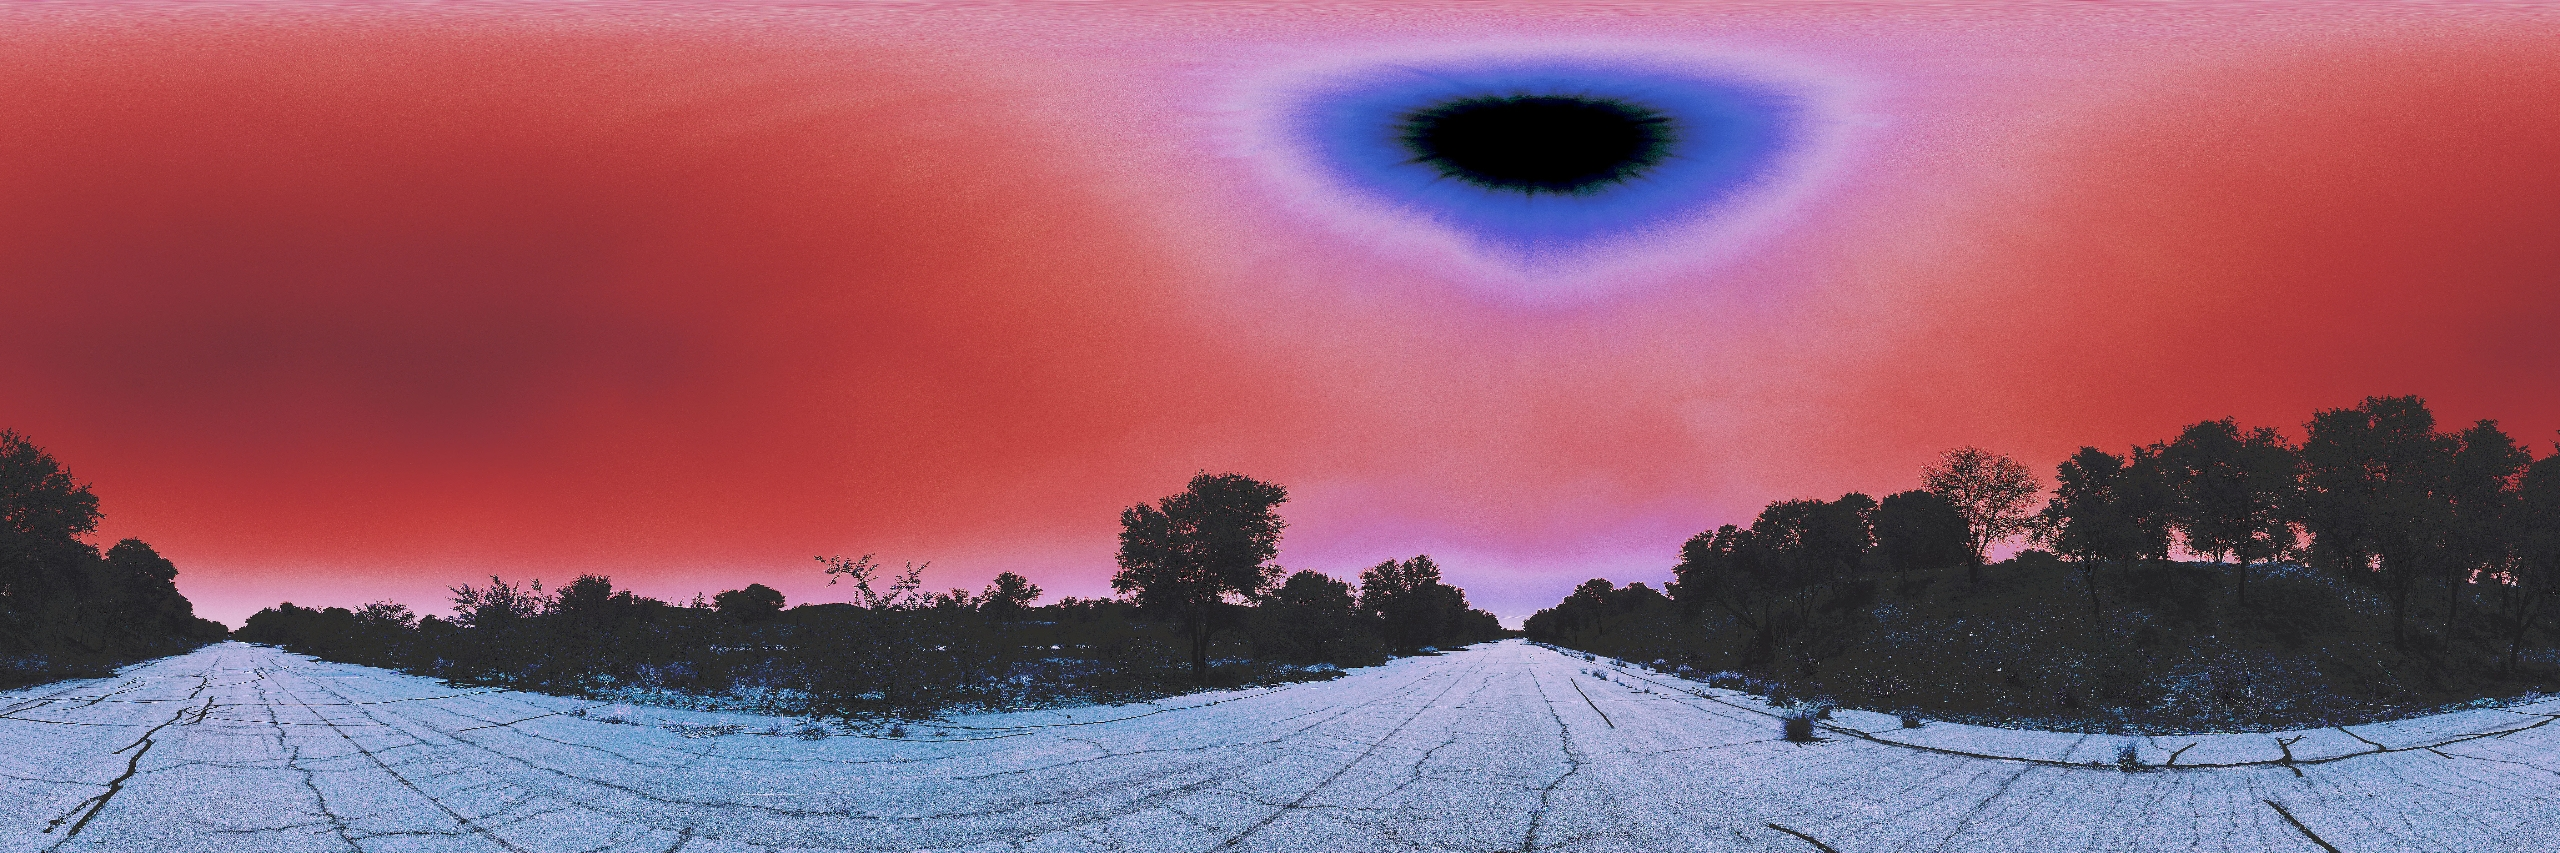 Gabriel Vincent Moon (@leperprint) Cover Image